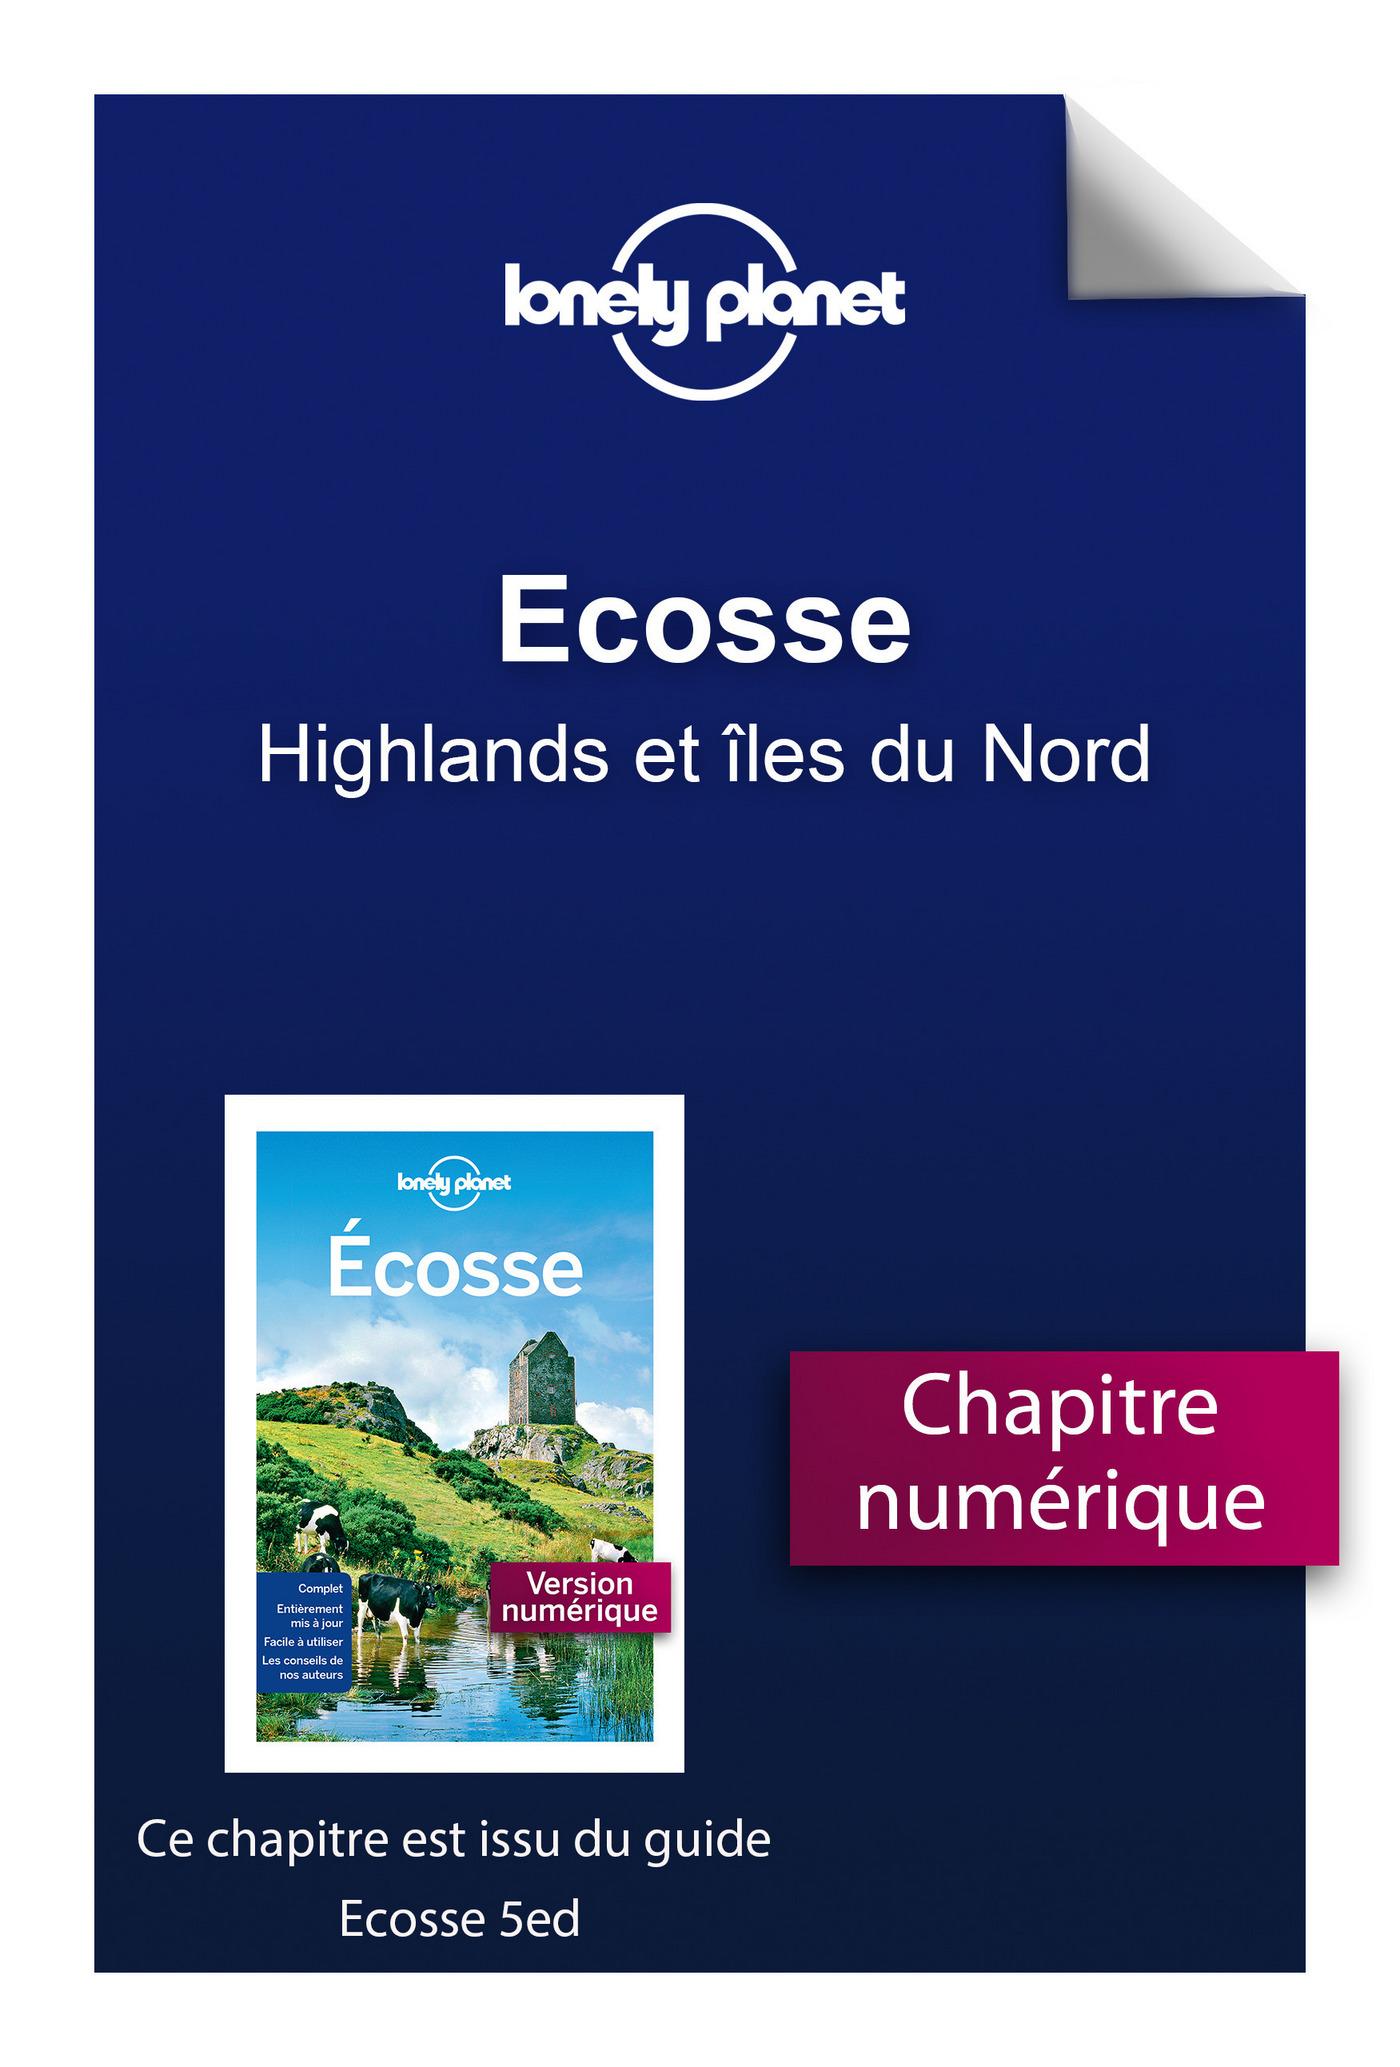 Ecosse 5 - Highlands et îles du Nord